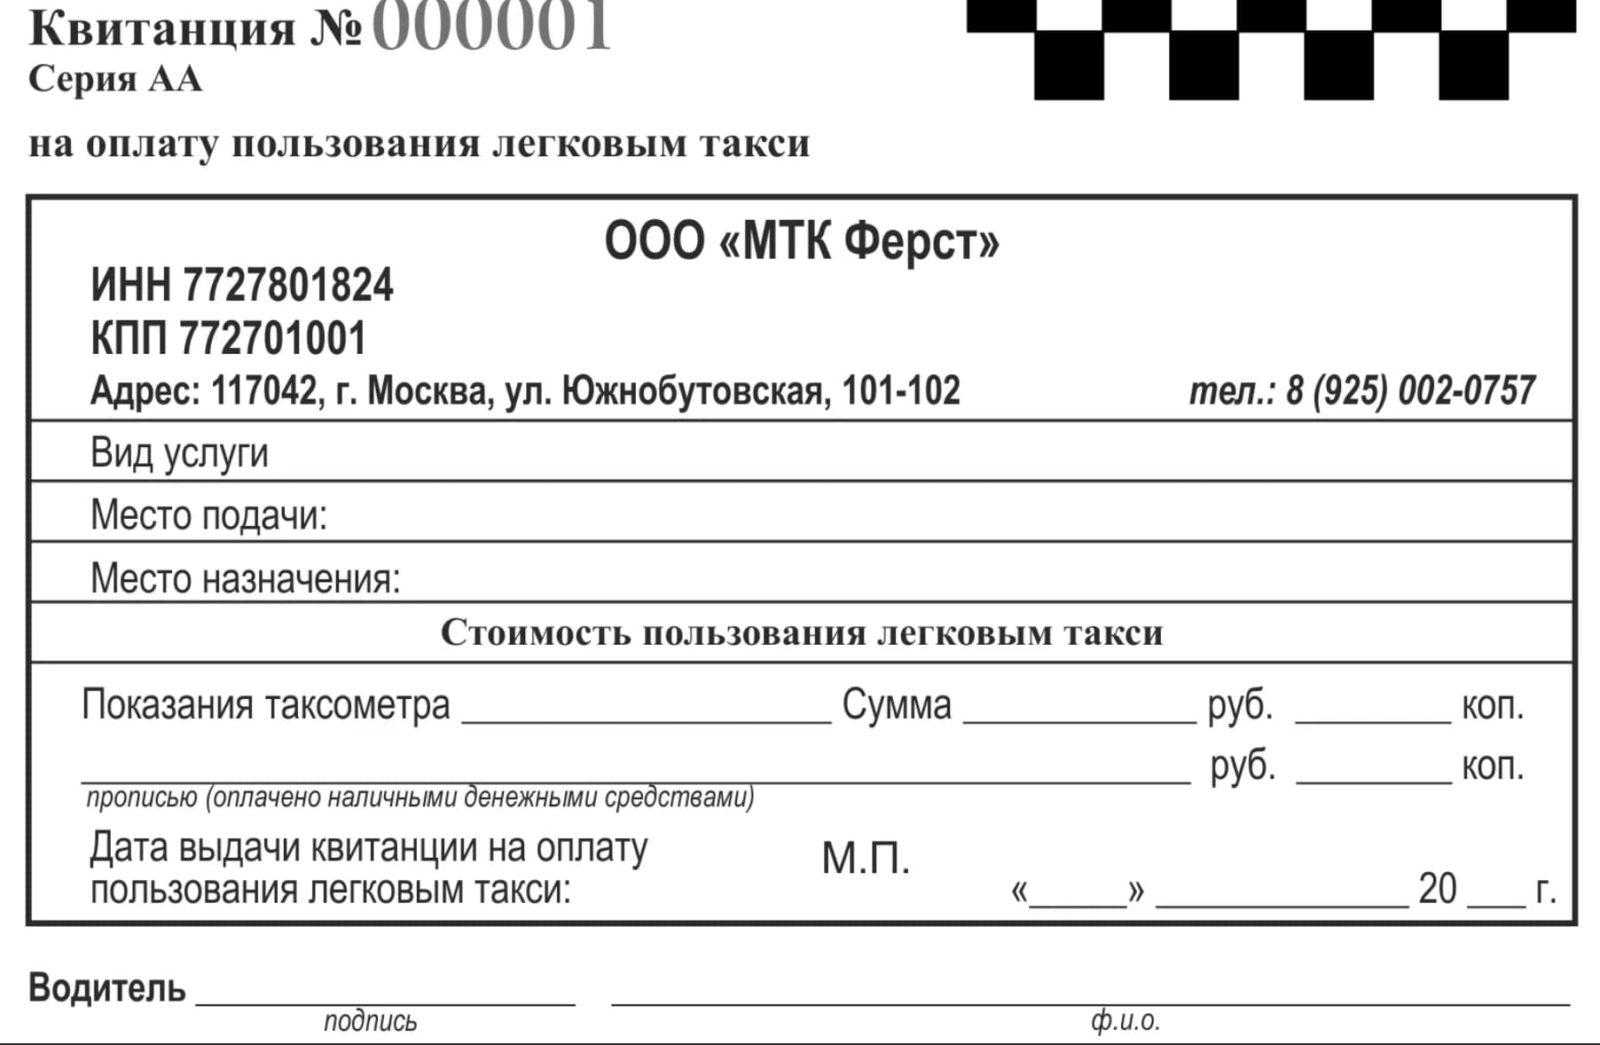 obrazec-bso-yandex-taxi